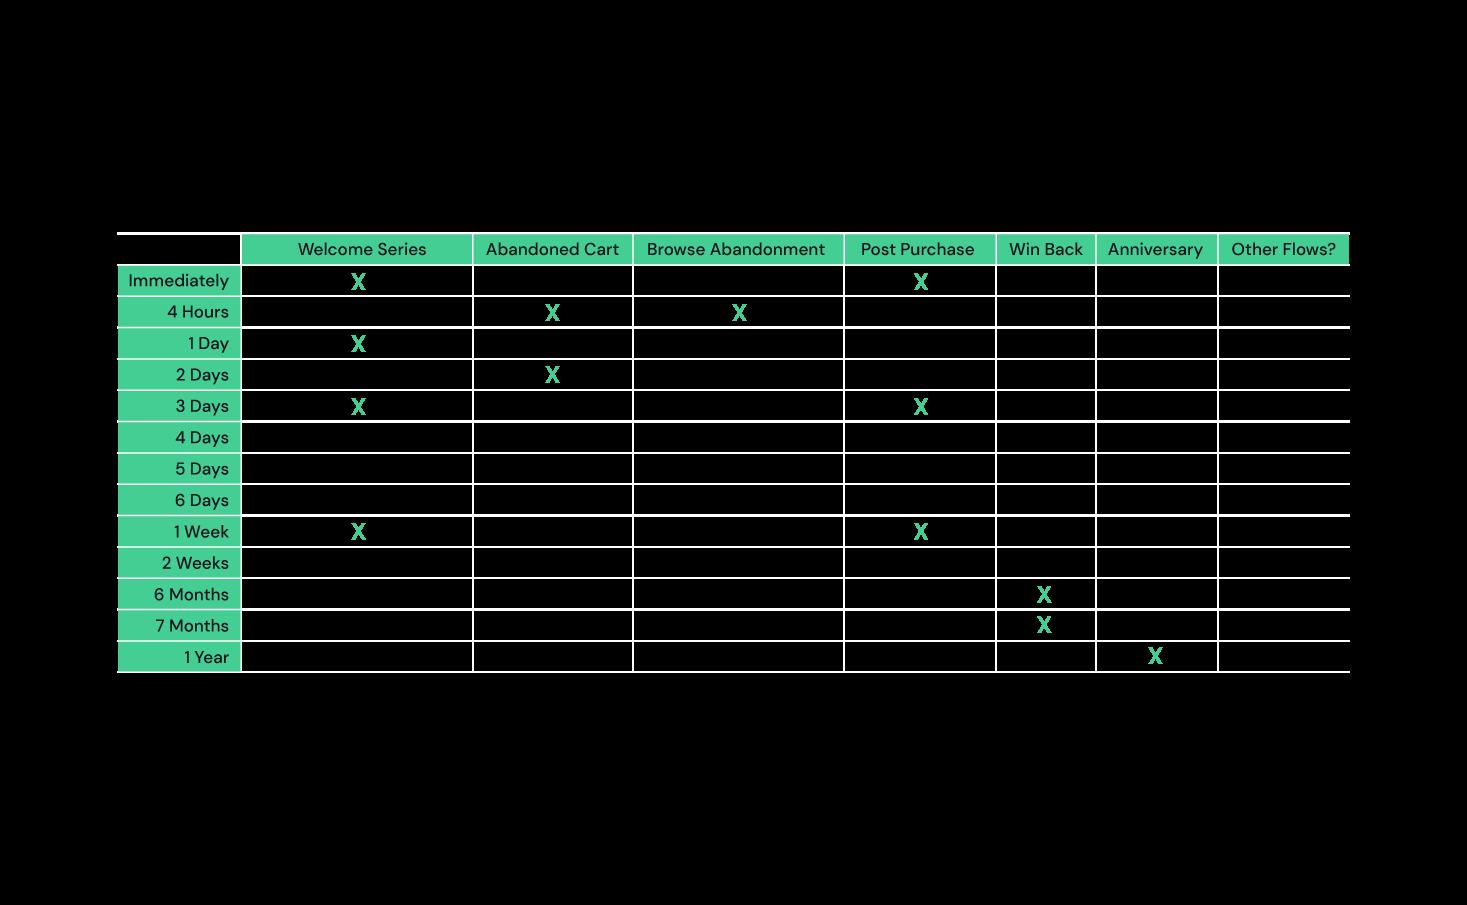 Conditionele split